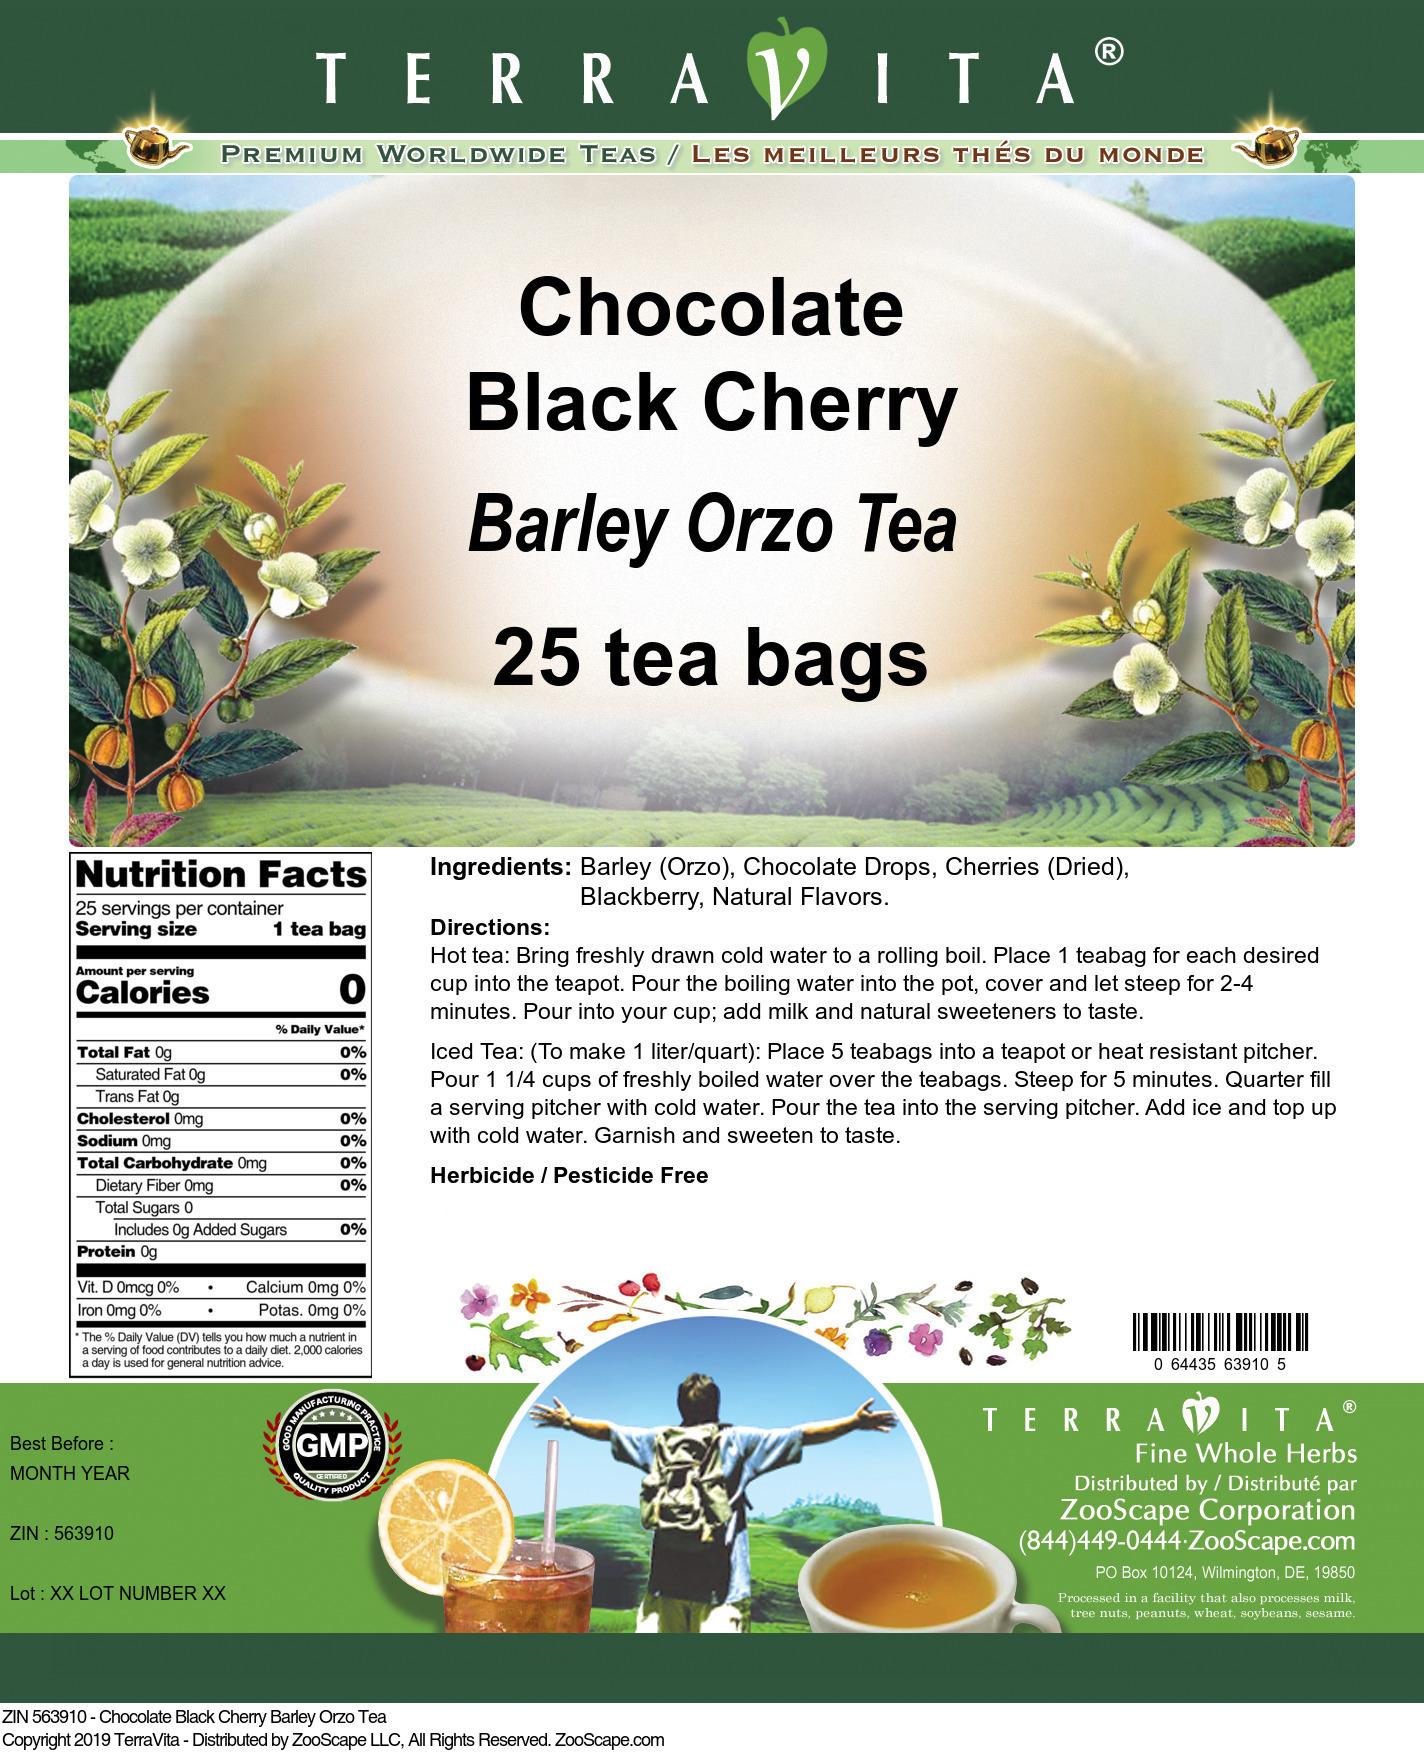 Chocolate Black Cherry Barley Orzo